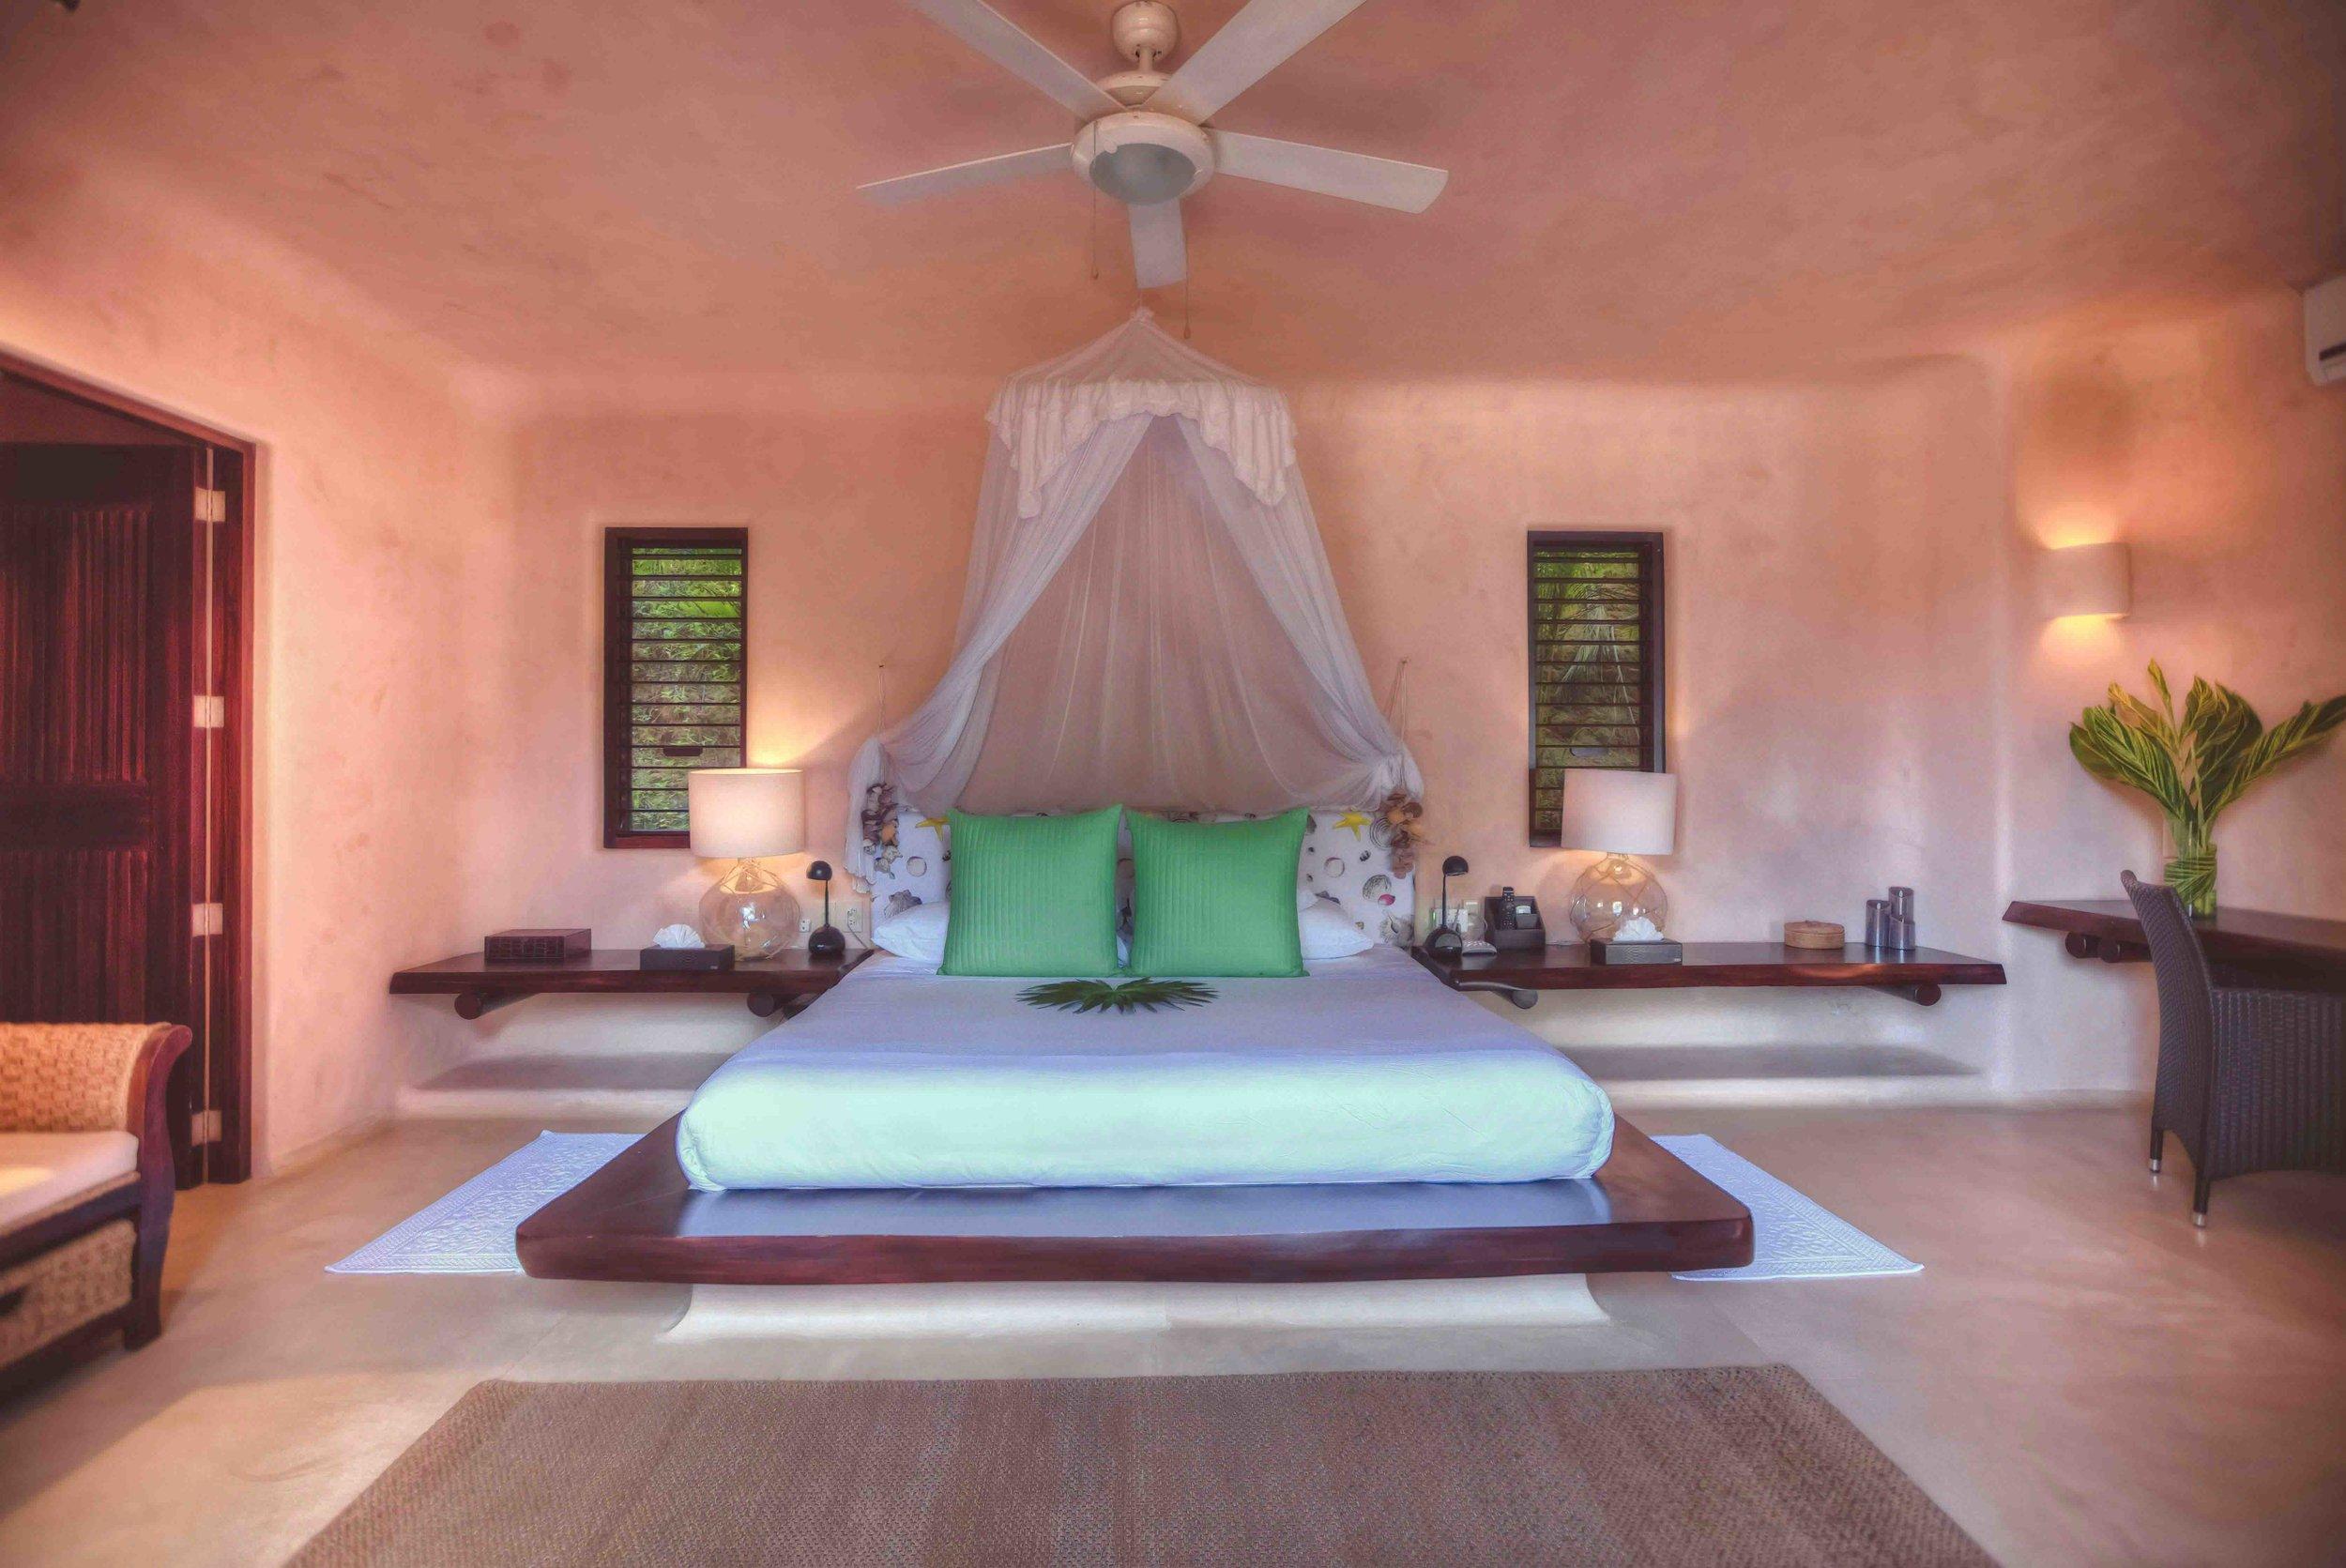 Luxury-Villa-Rental-Mexico-9.jpg